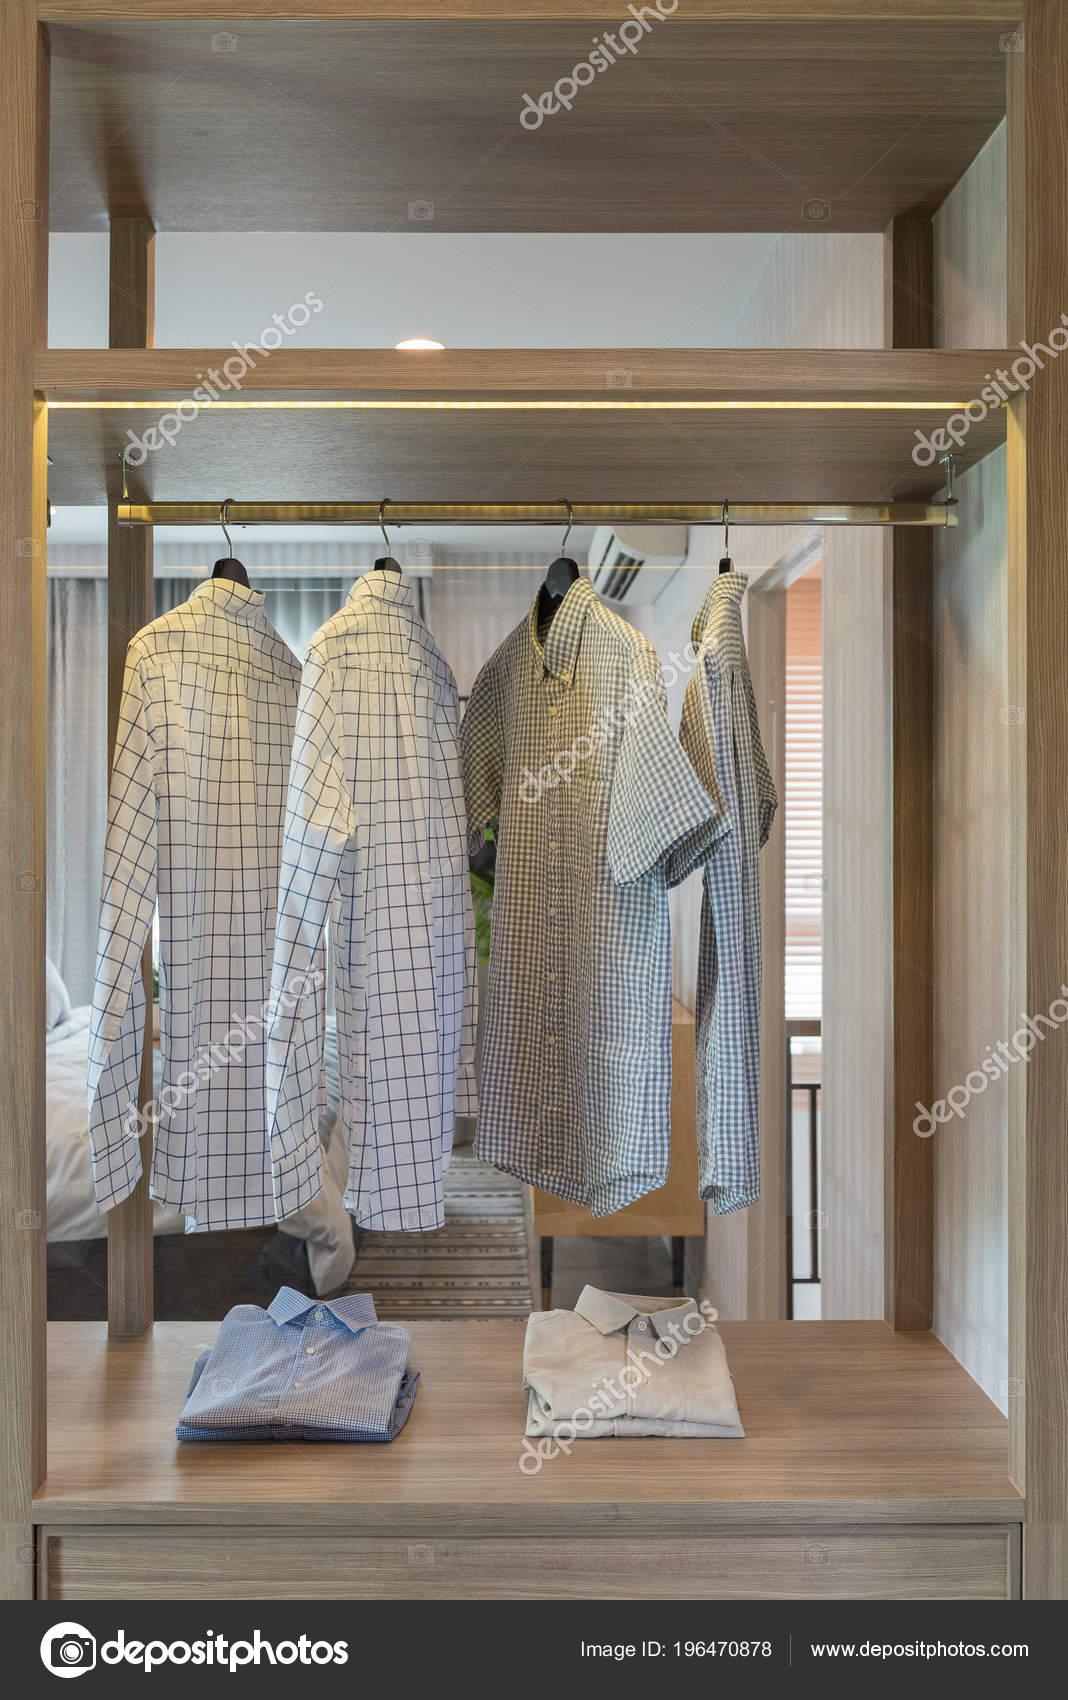 Tringle Vetements Accroches Dans Garde Robe Moderne Concept Design